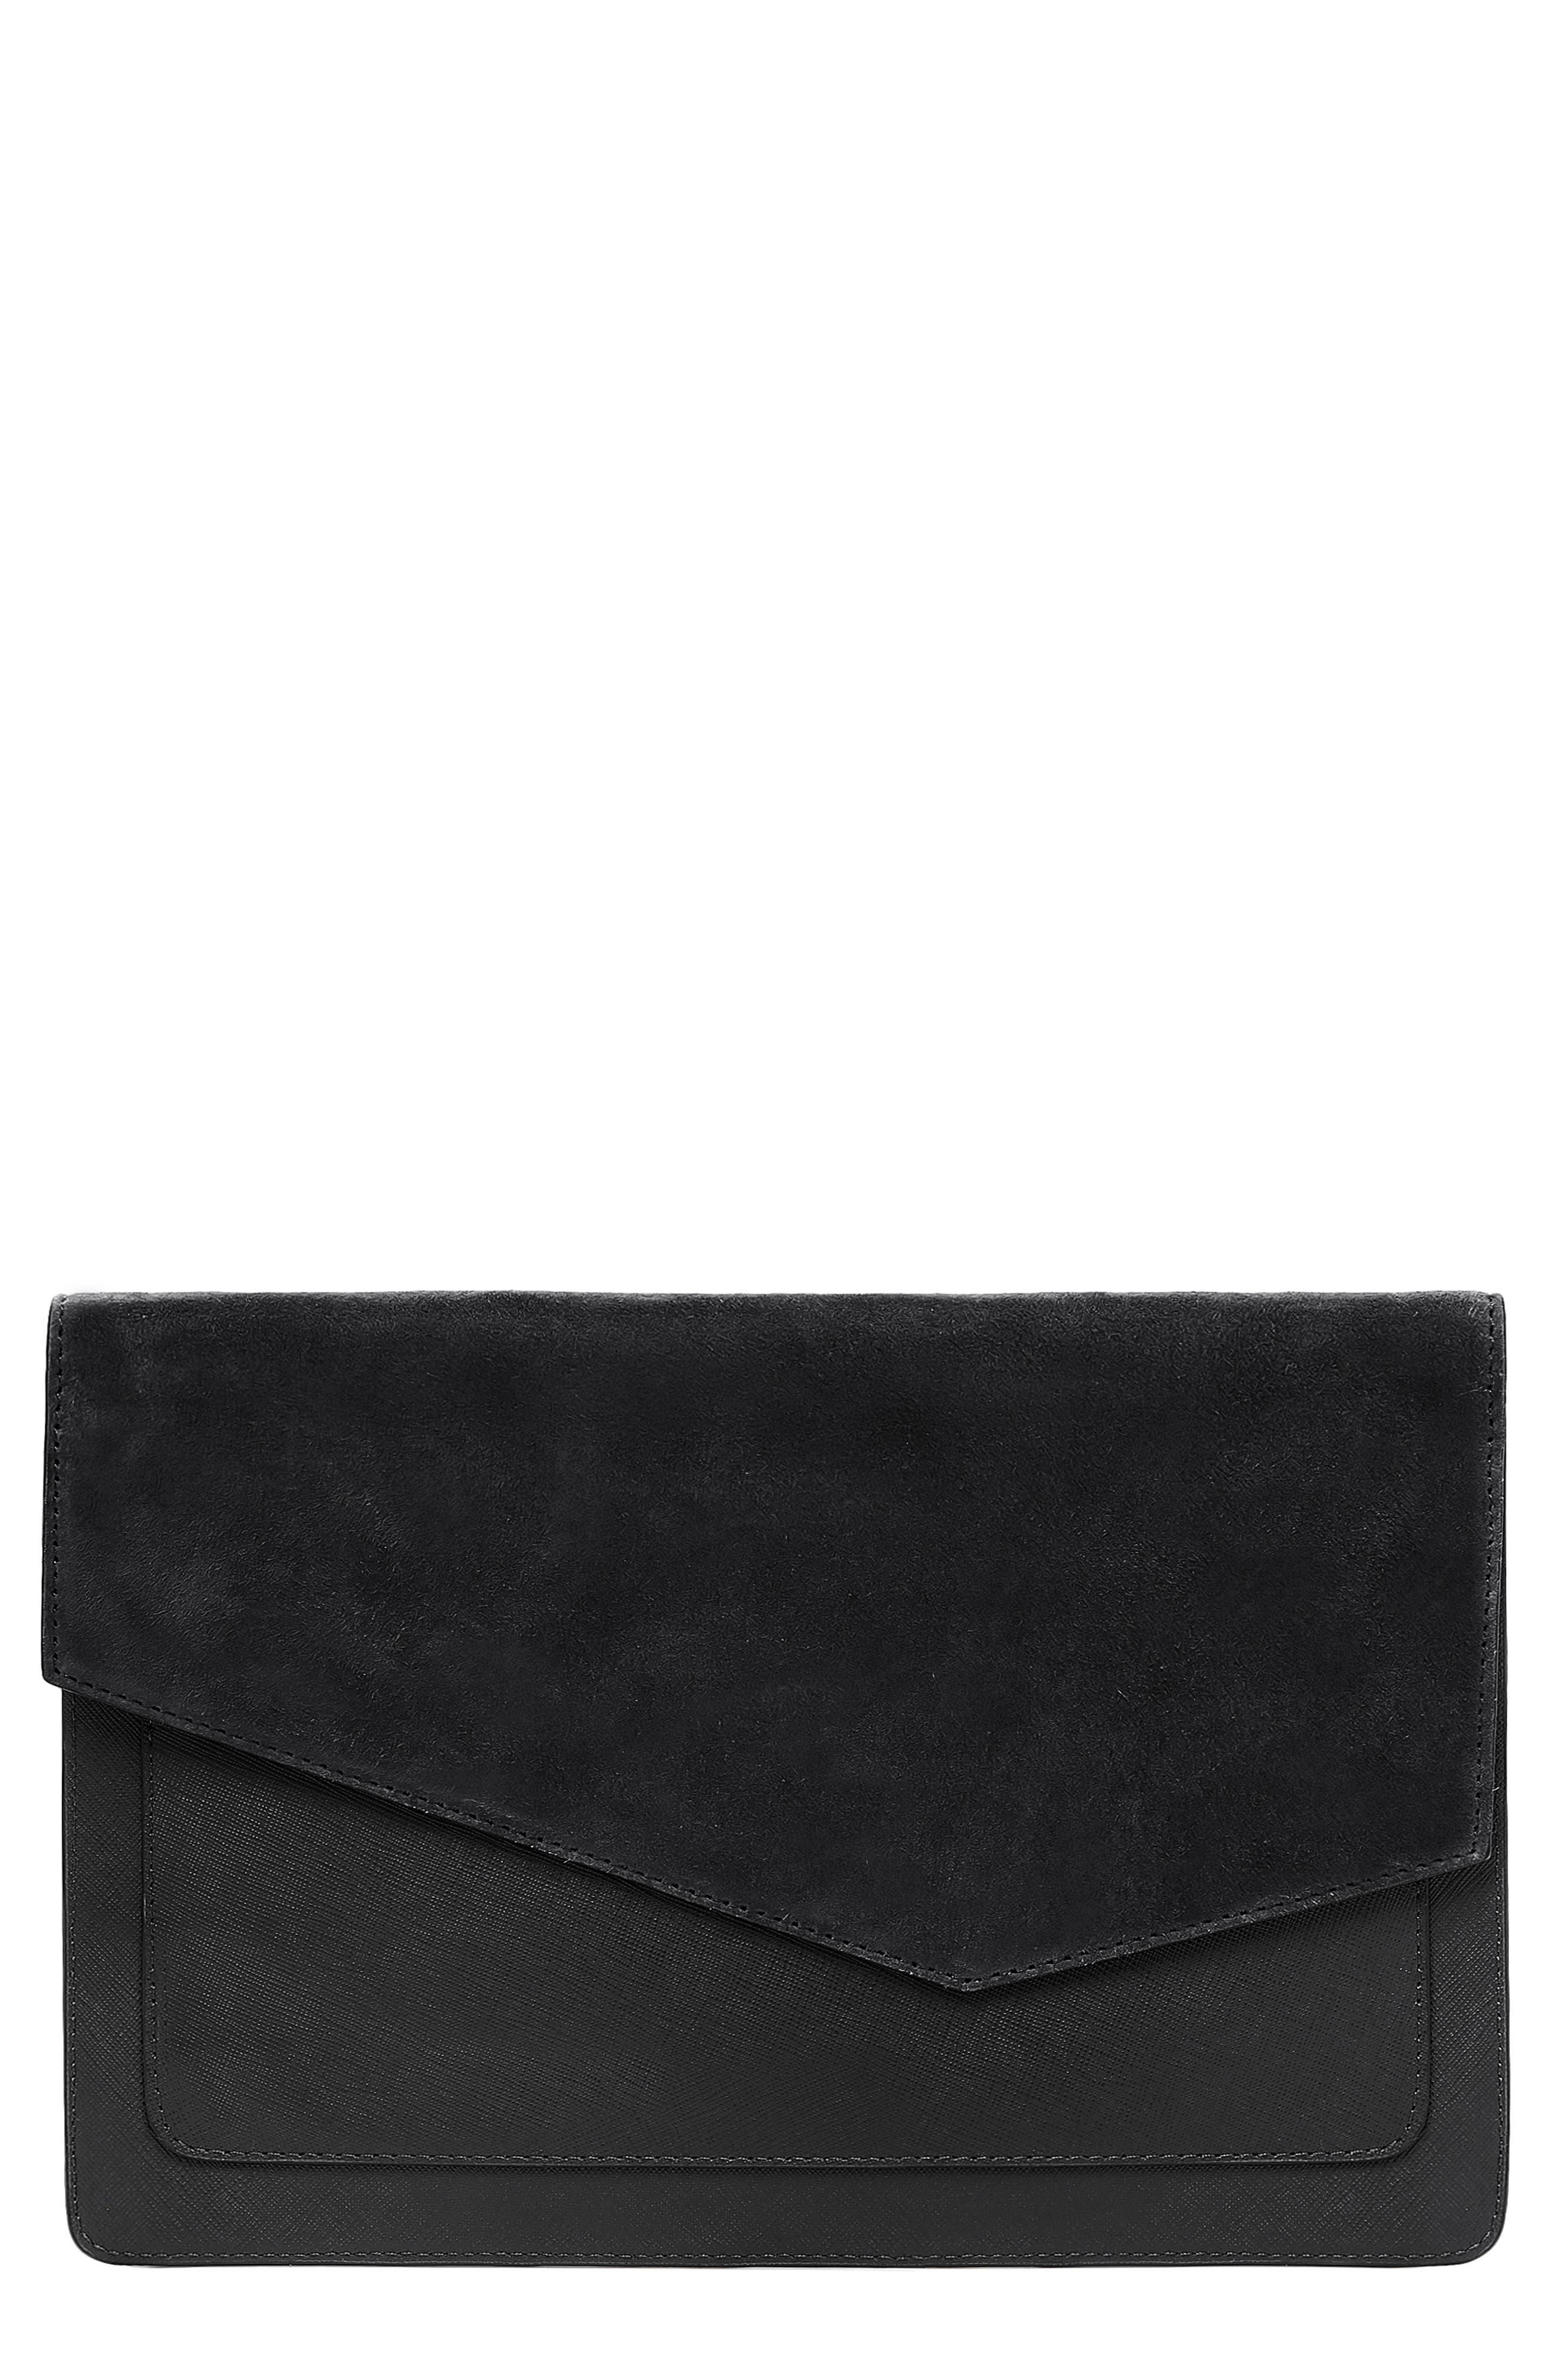 BOTKIER Cobble Hill Calfskin Leather Flap Clutch, Main, color, 001